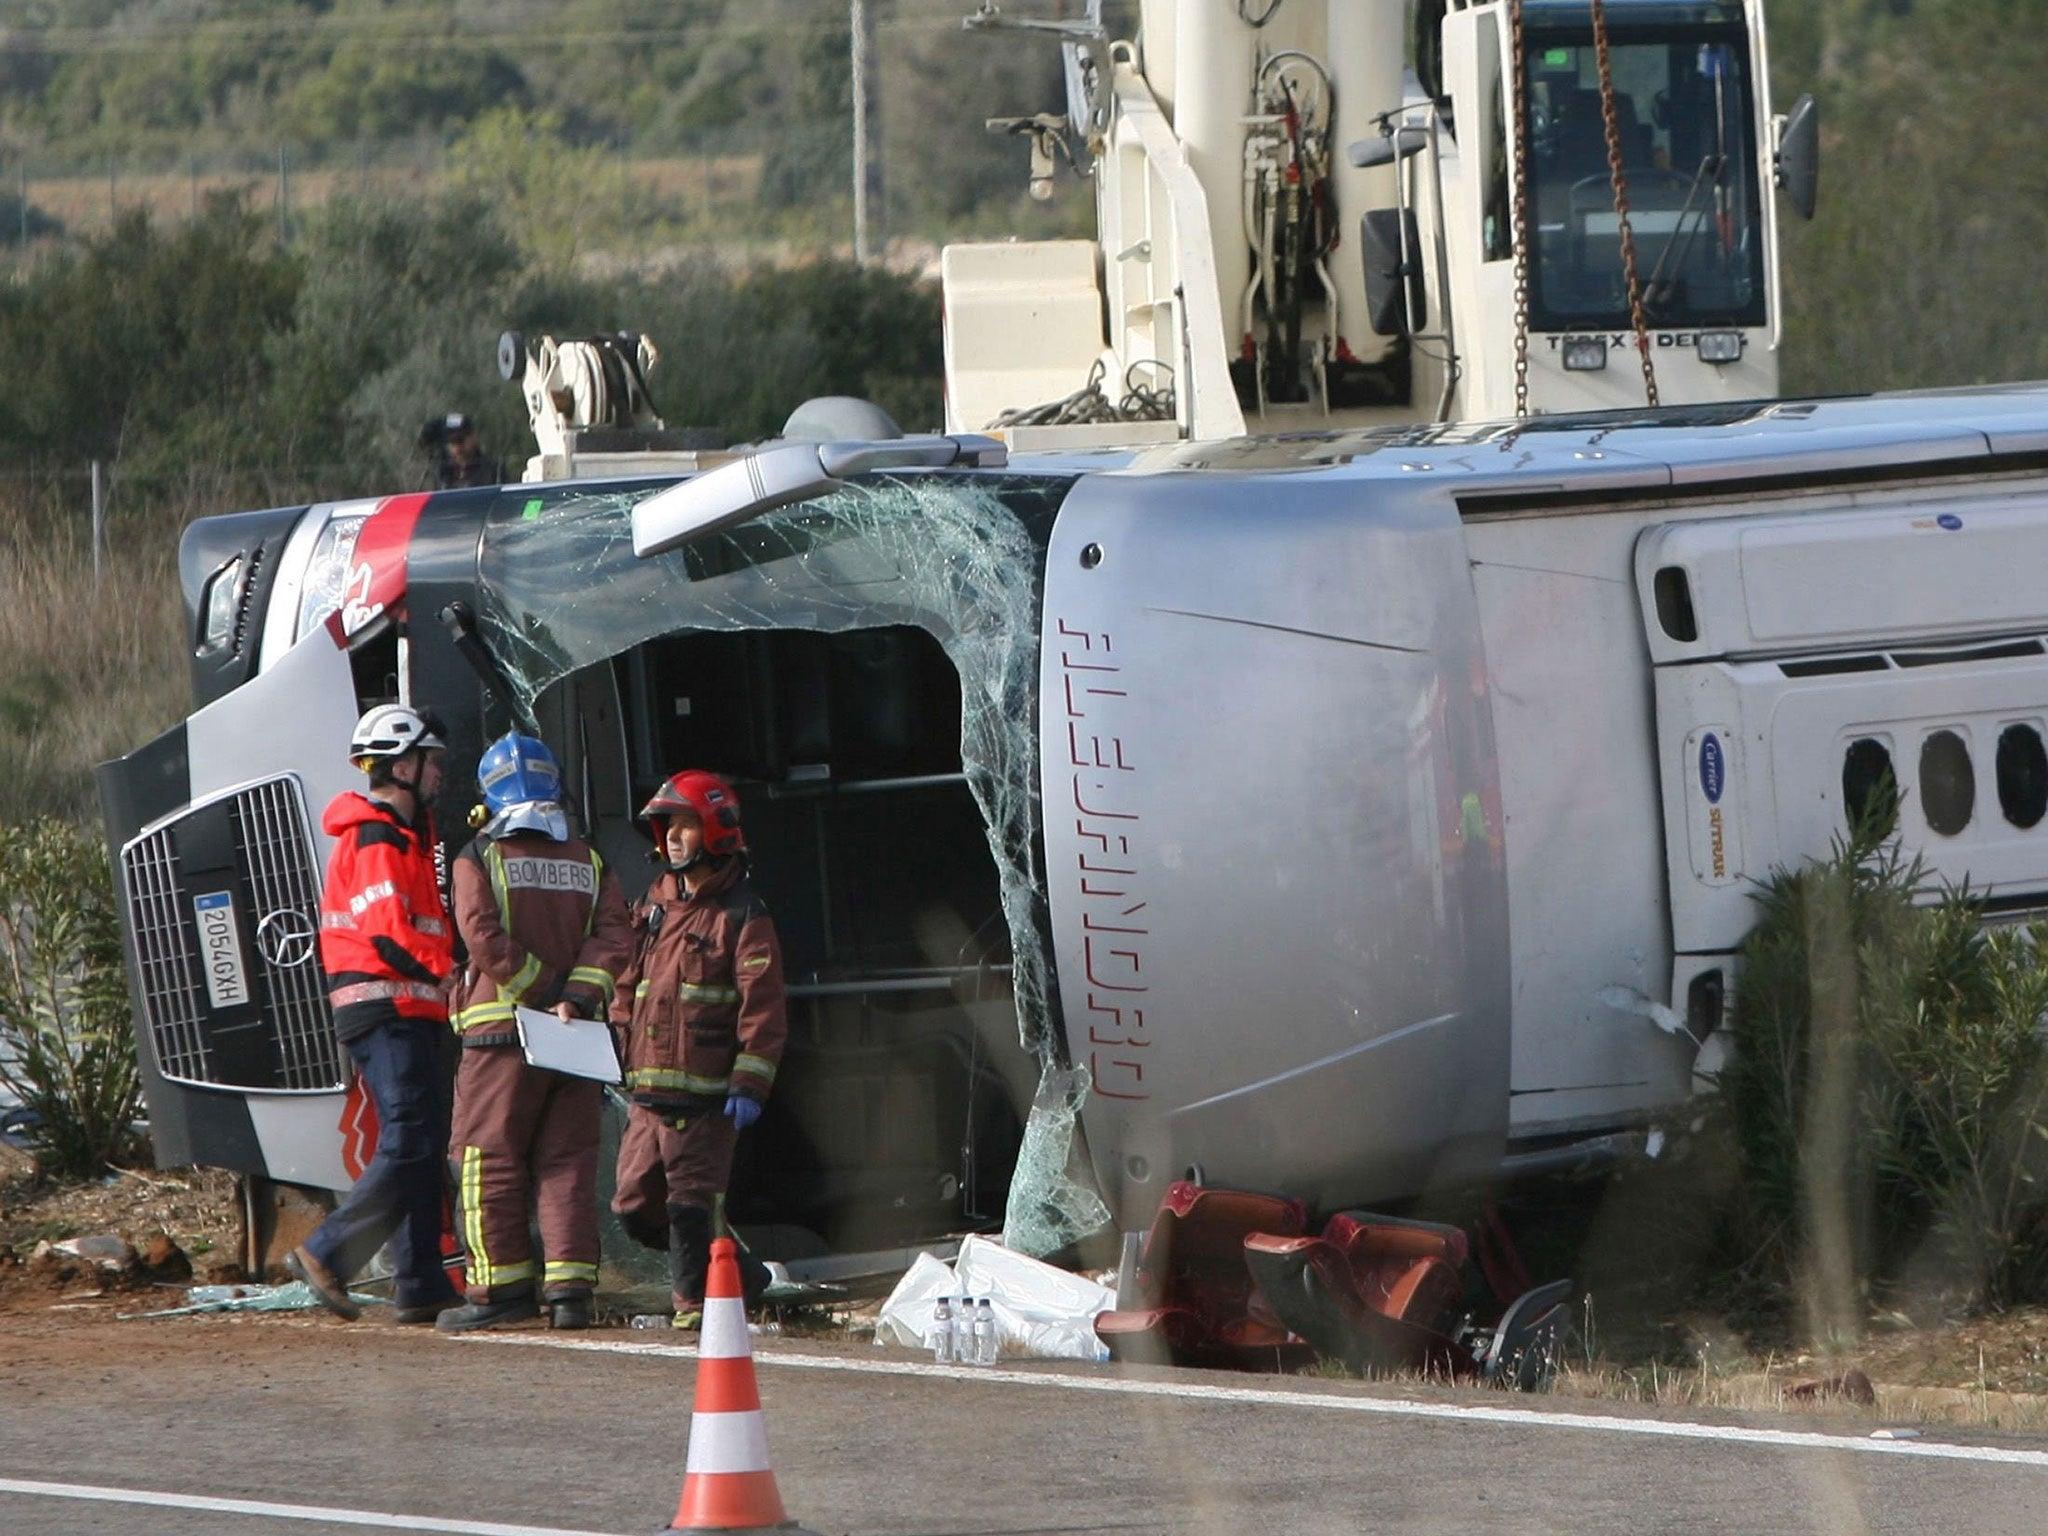 British and Irish students among those on board in fatal Spanish bus crash